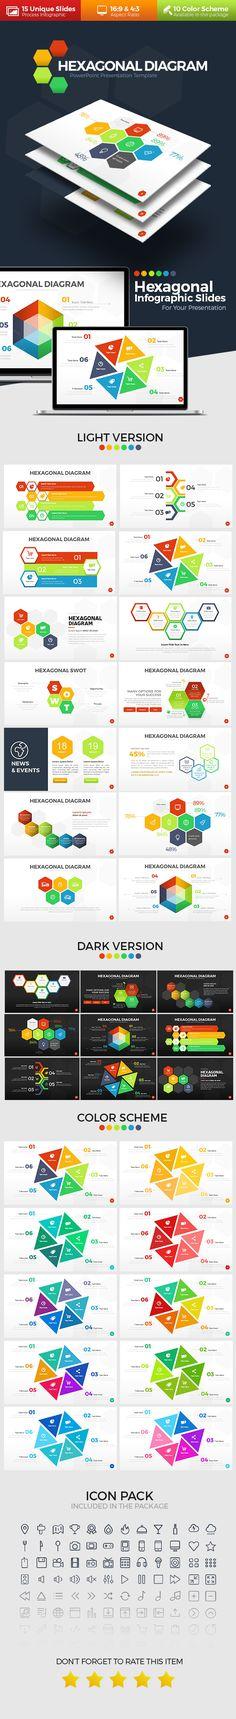 Hexagonal Infographic PowerPoint Template. Download here: https://graphicriver.net/item/hexagonal-infographic/17429049?ref=ksioks